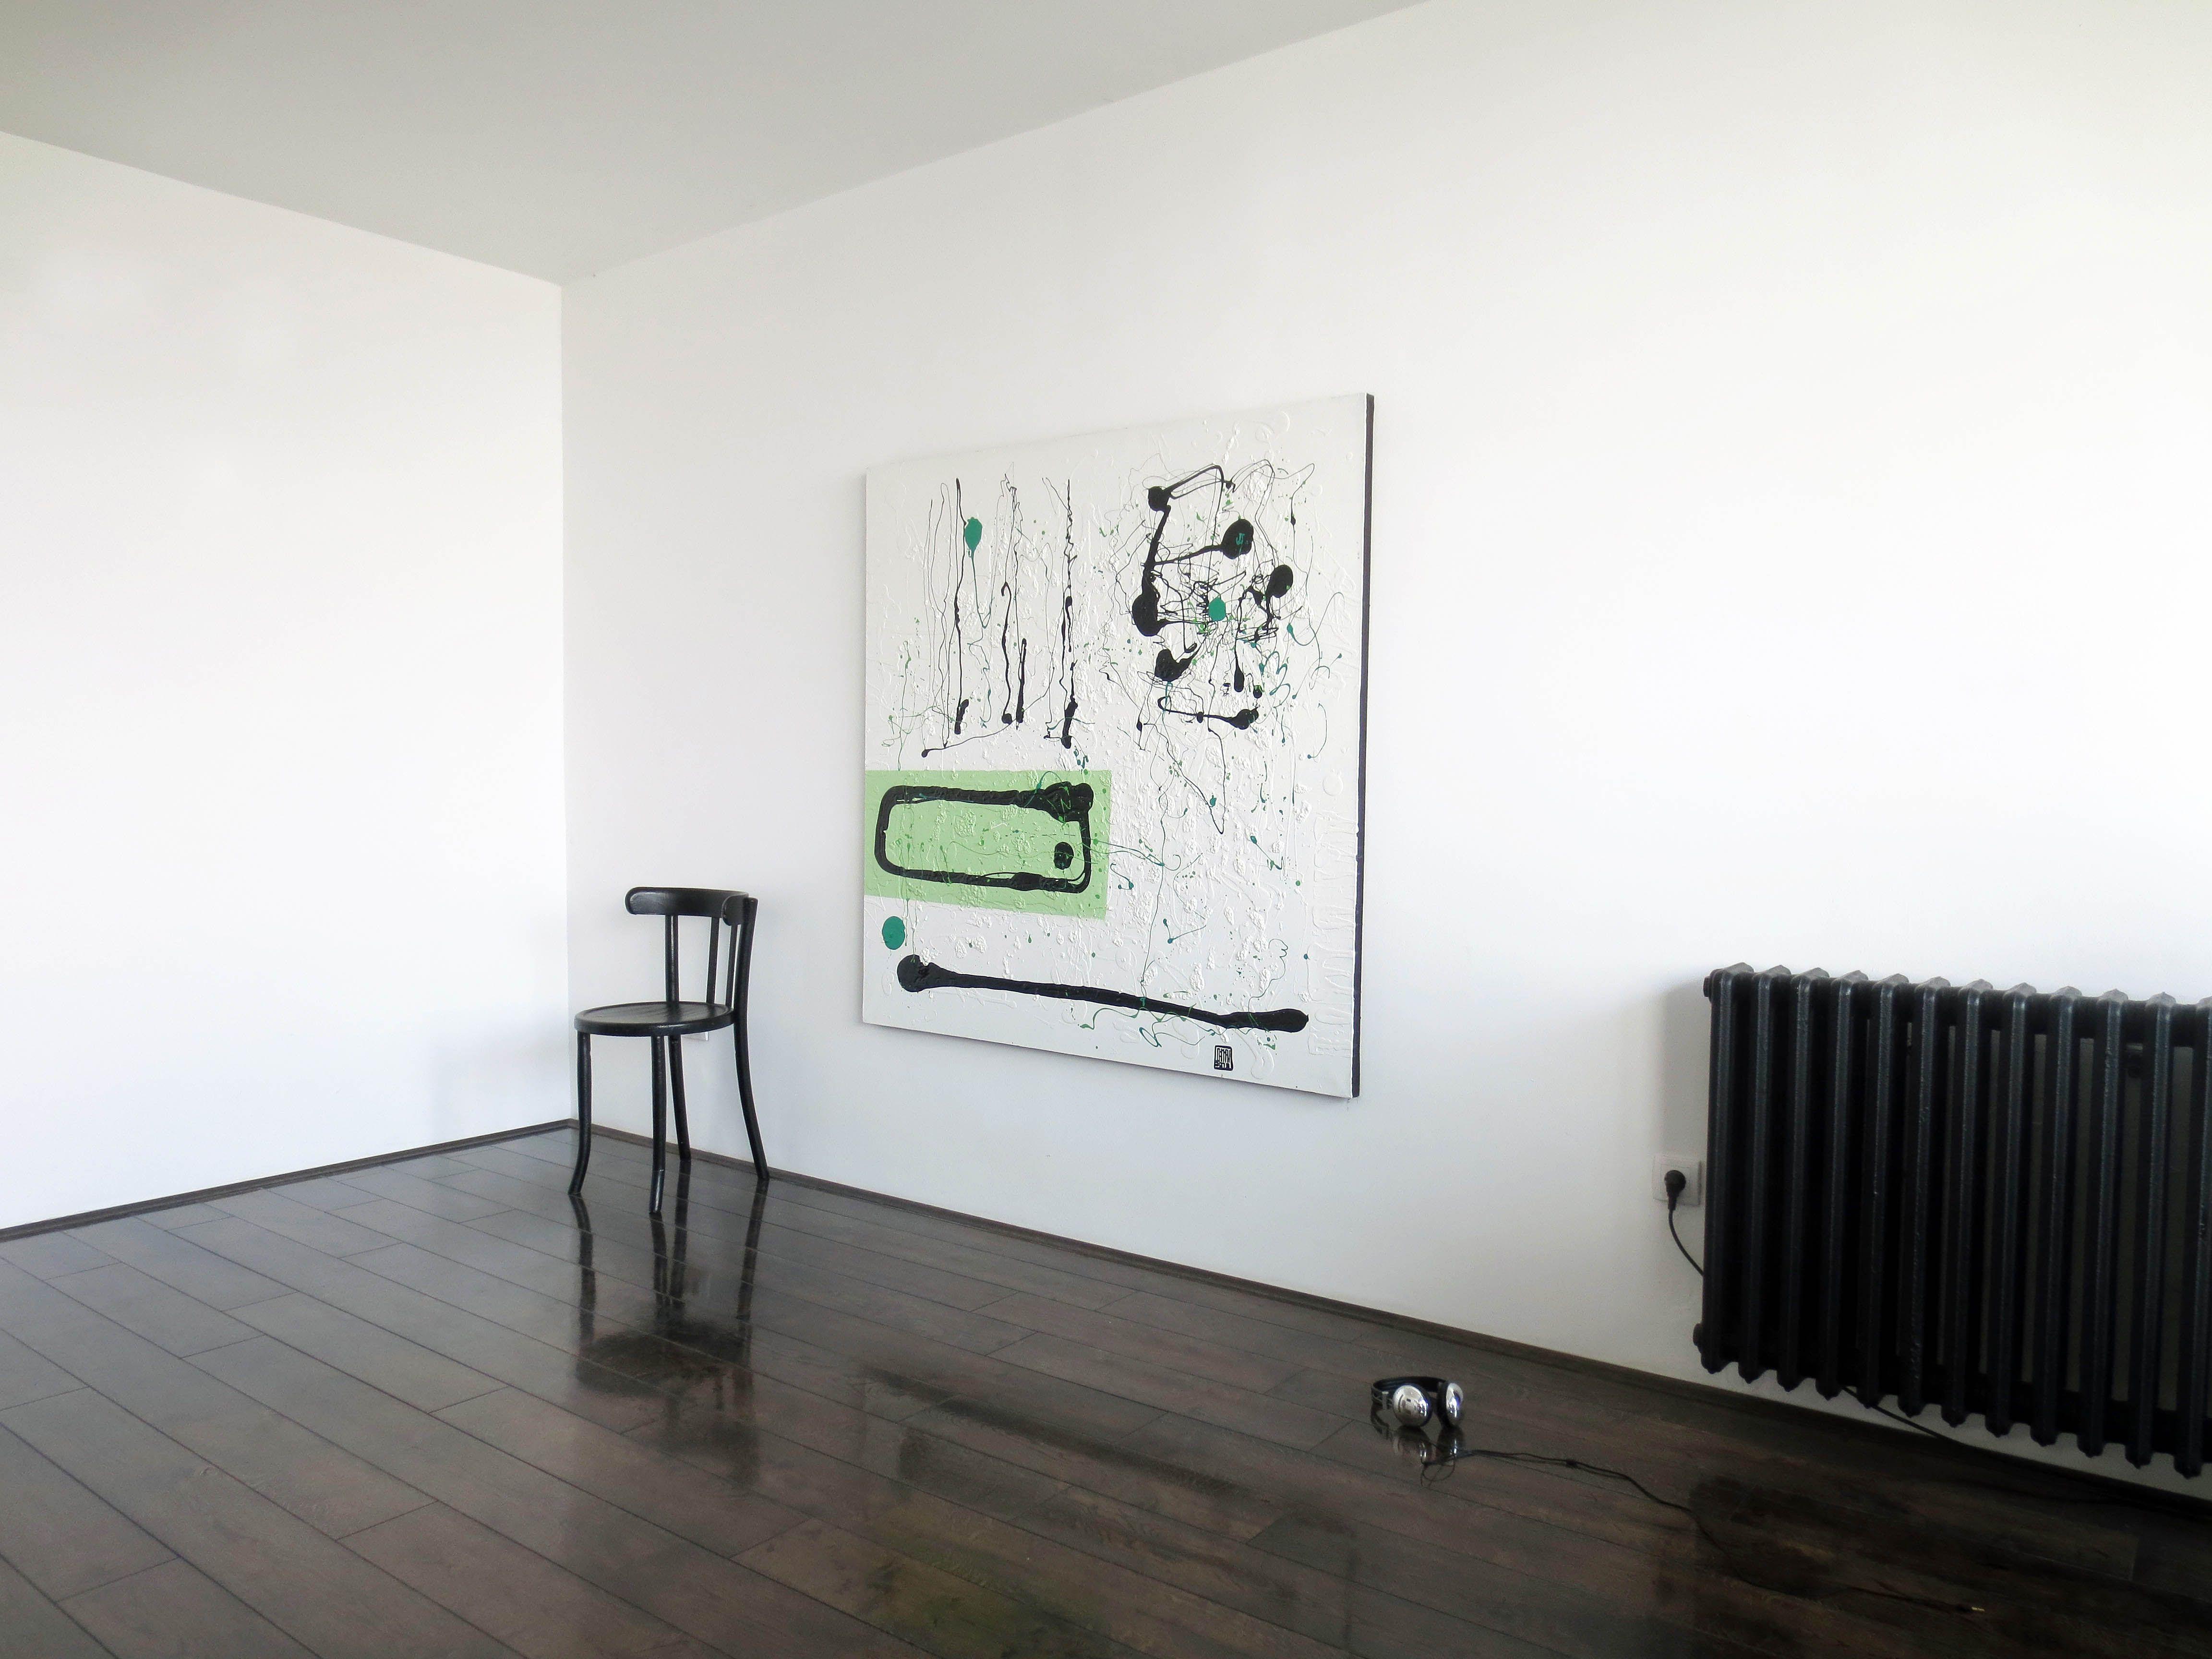 A30 Contemporary abstract Spiritual Architecture Landscape Acrylic